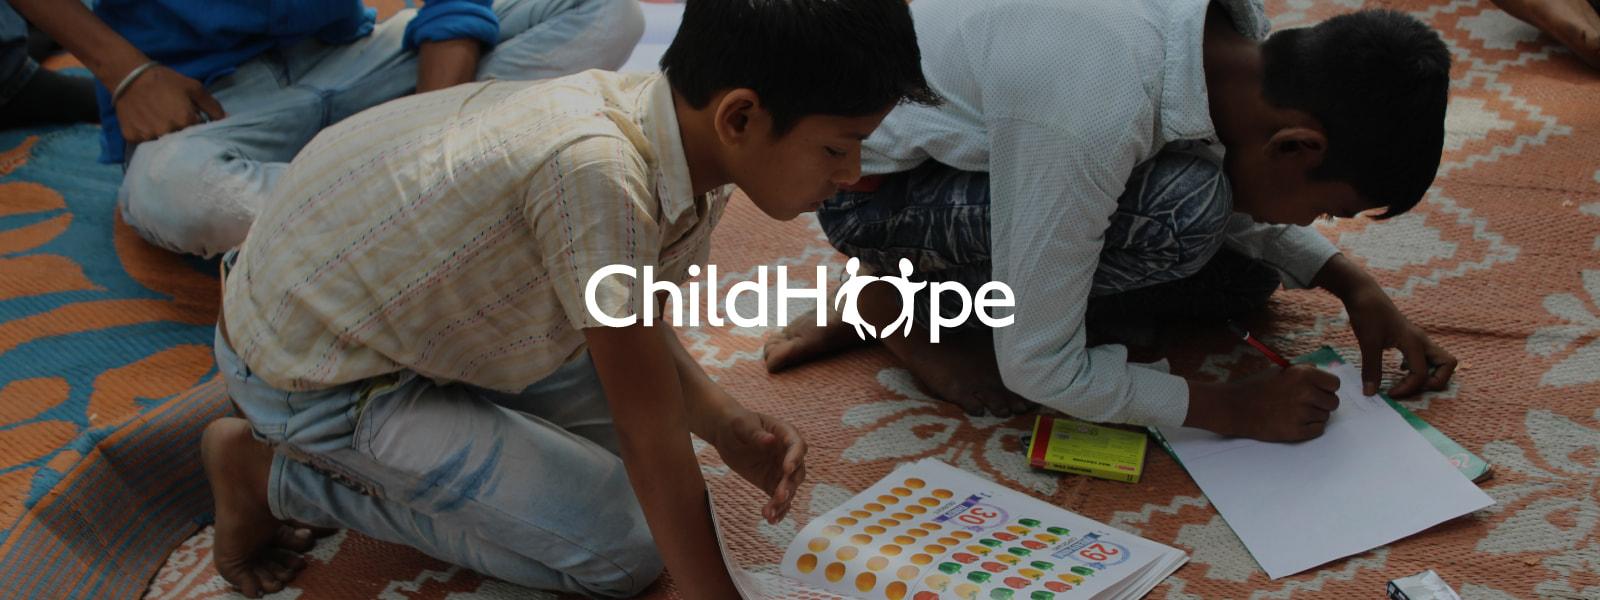 ChildHope, children reading books